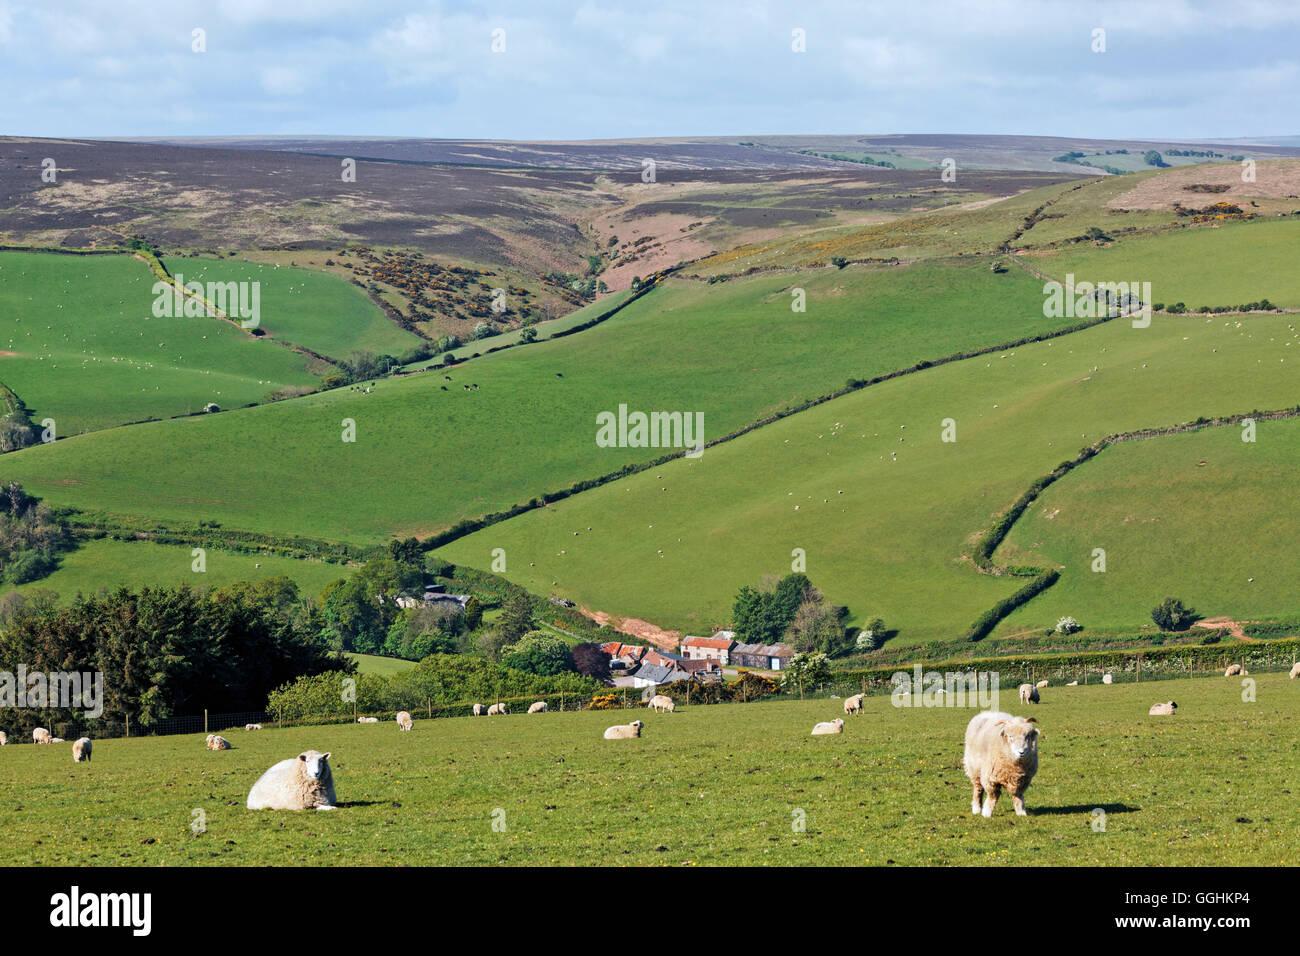 Exmoor landscape west of Porlock, Somerset, England, Great Britain - Stock Image